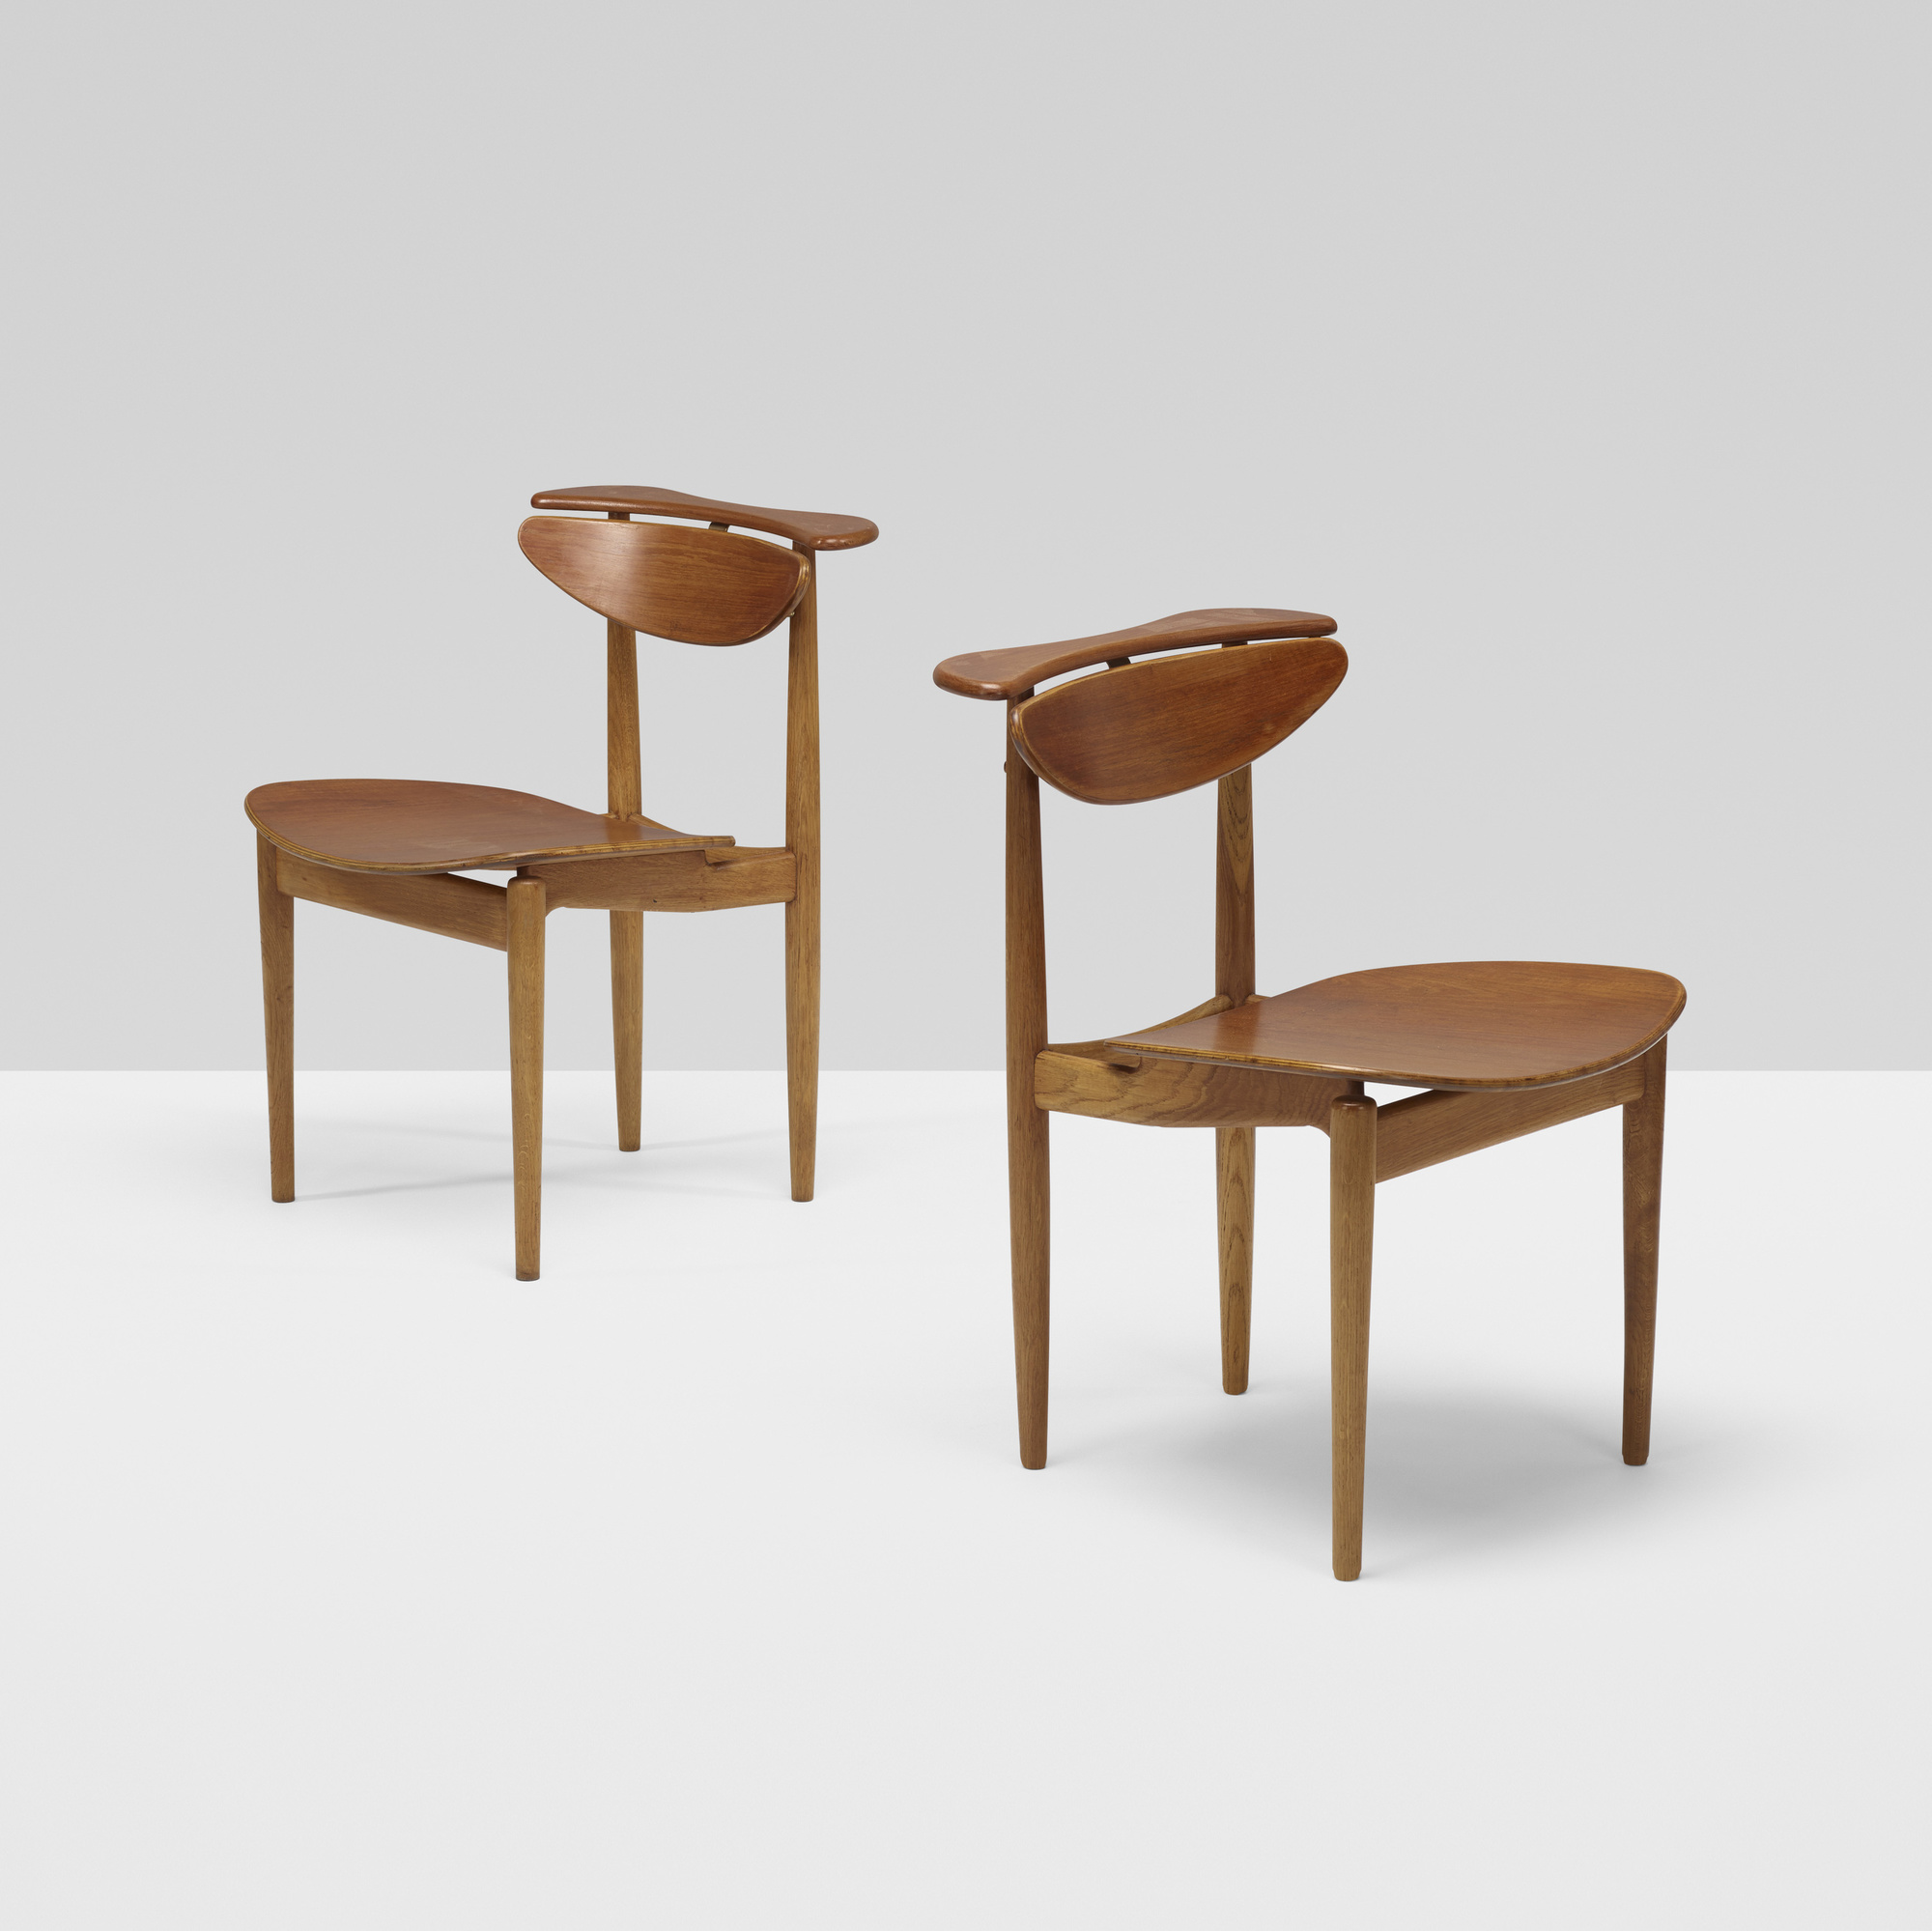 378: Finn Juhl / chairs, pair (1 of 4)